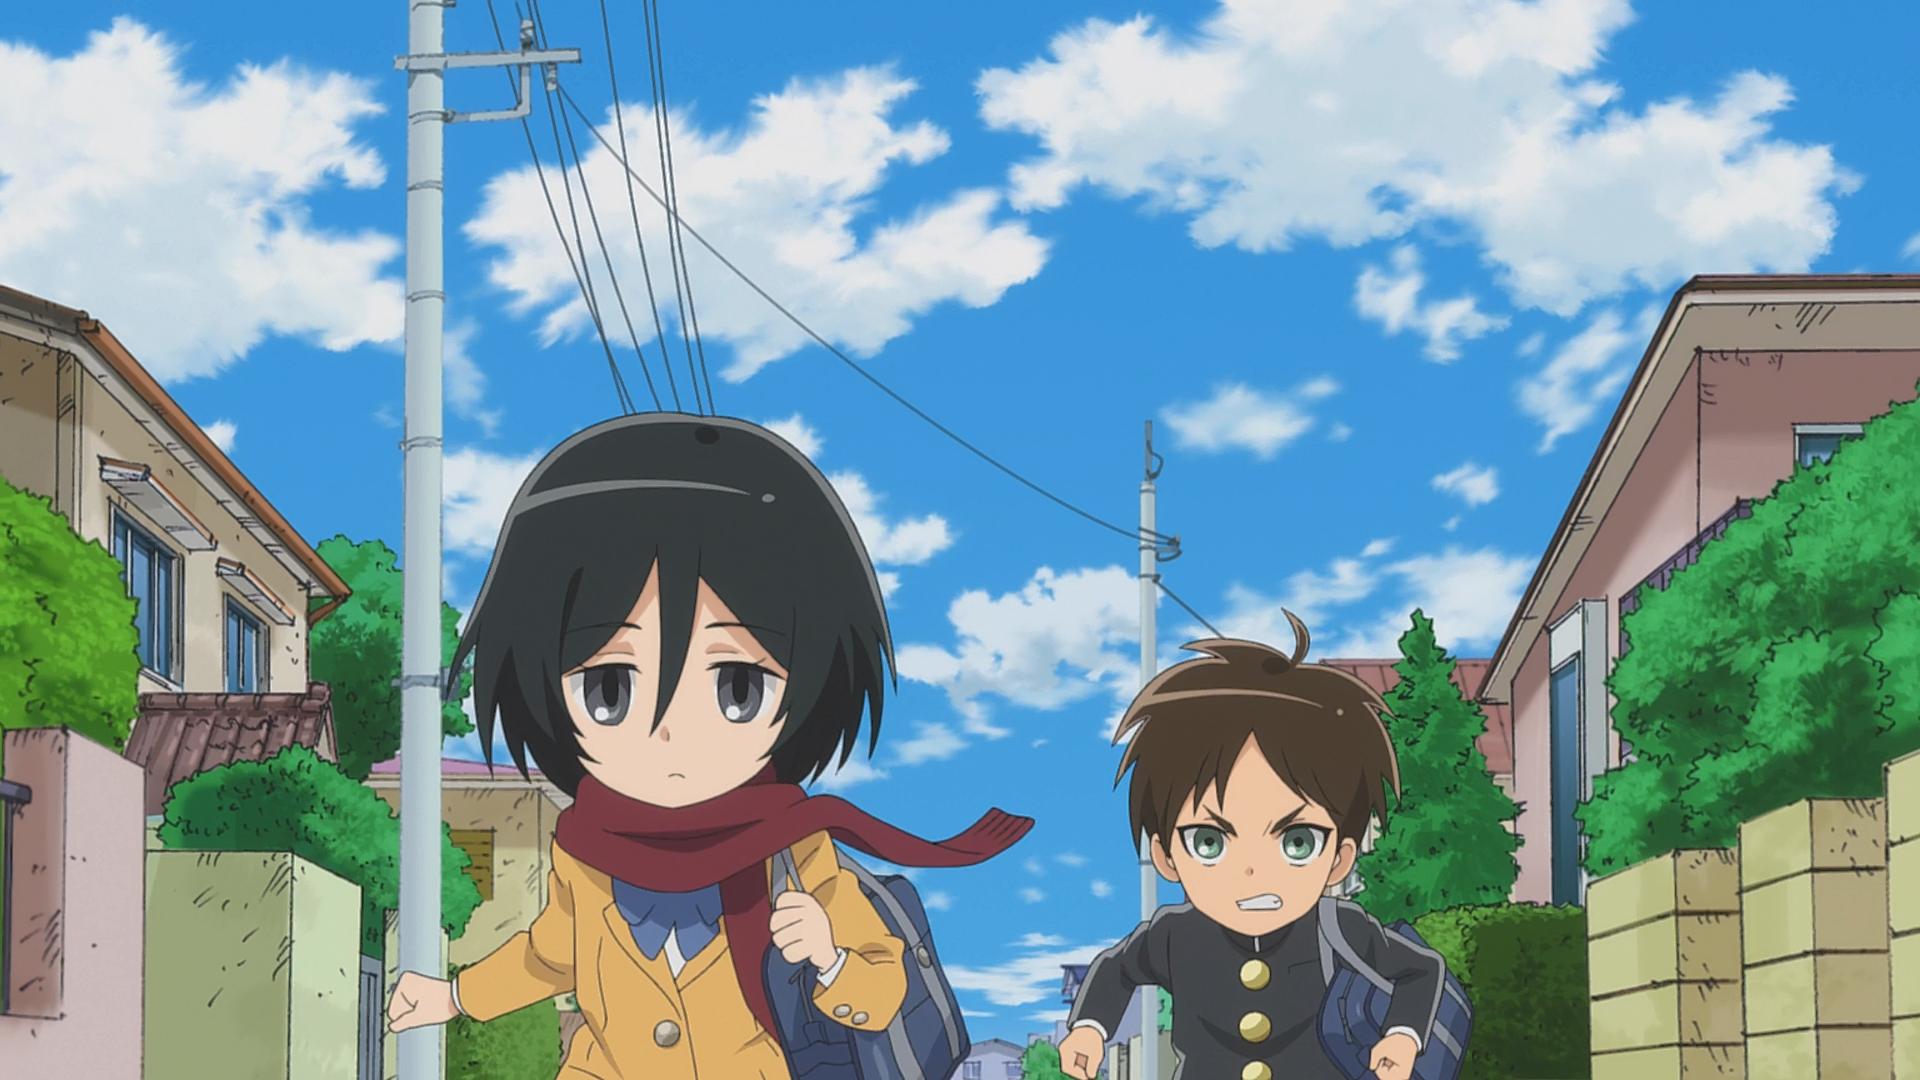 Category Images Of Mikasa Ackermann Junior High Anime Attack On Titan Wiki Fandom